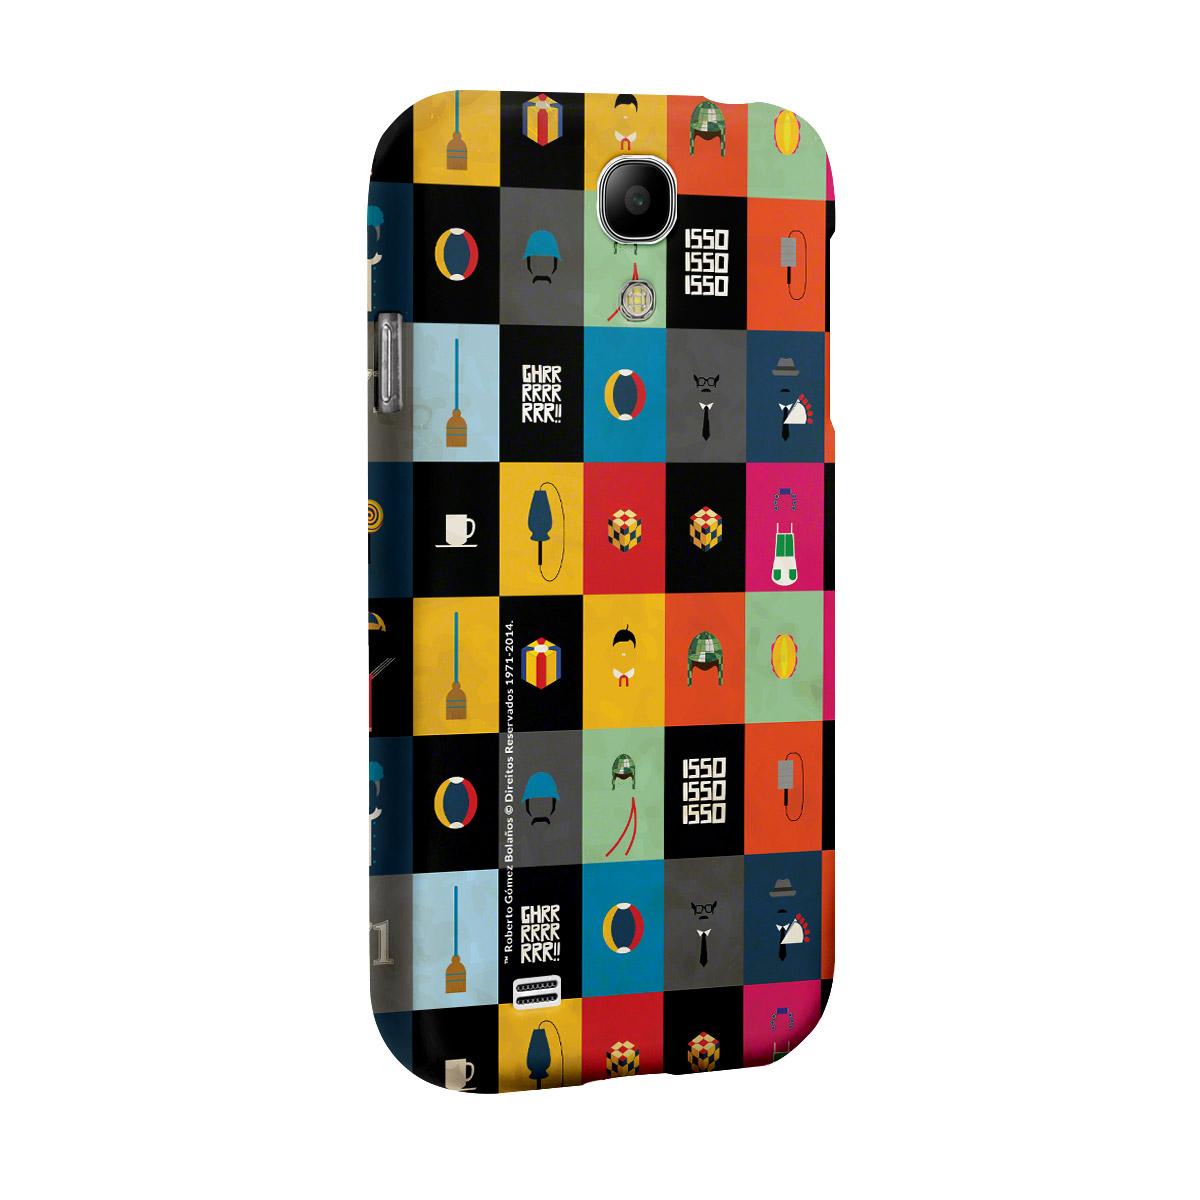 Capa de Celular Samsung Galaxy S4 Chaves Ícones Turma do Chaves Vintage